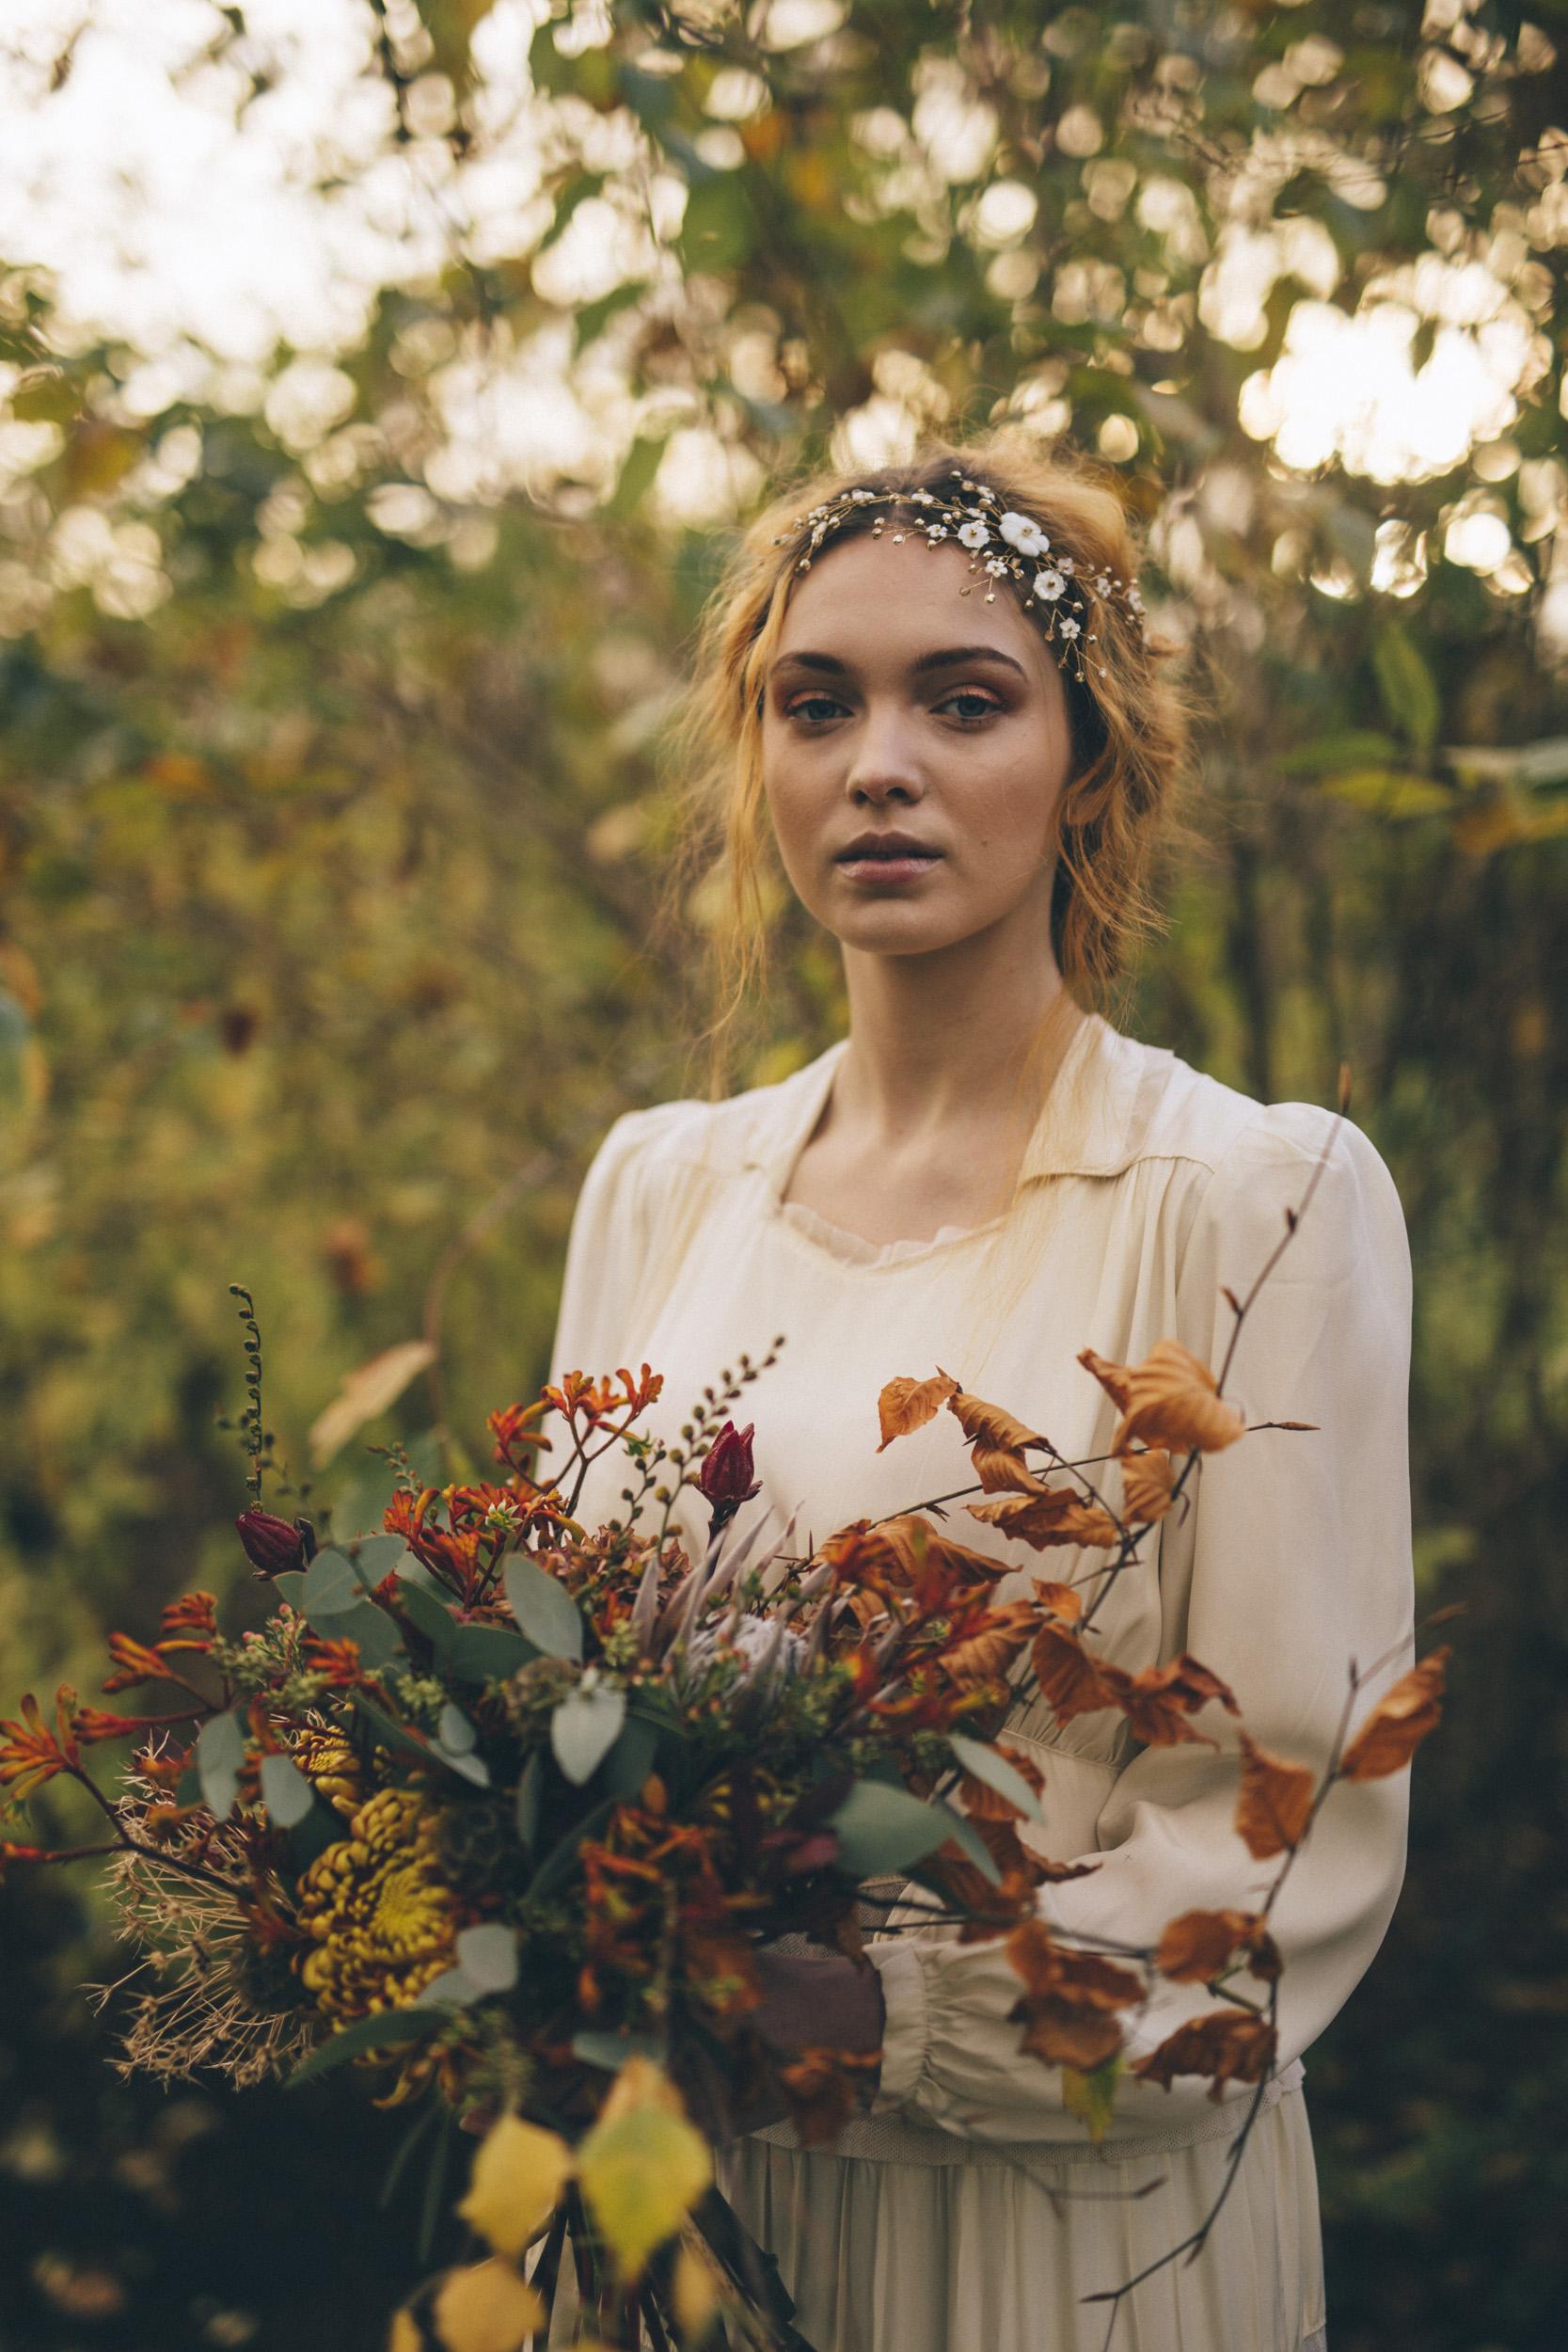 Autumn-Leaves-Shelley-Richmond-Kate-Beaumont-Sheffield-14.jpg